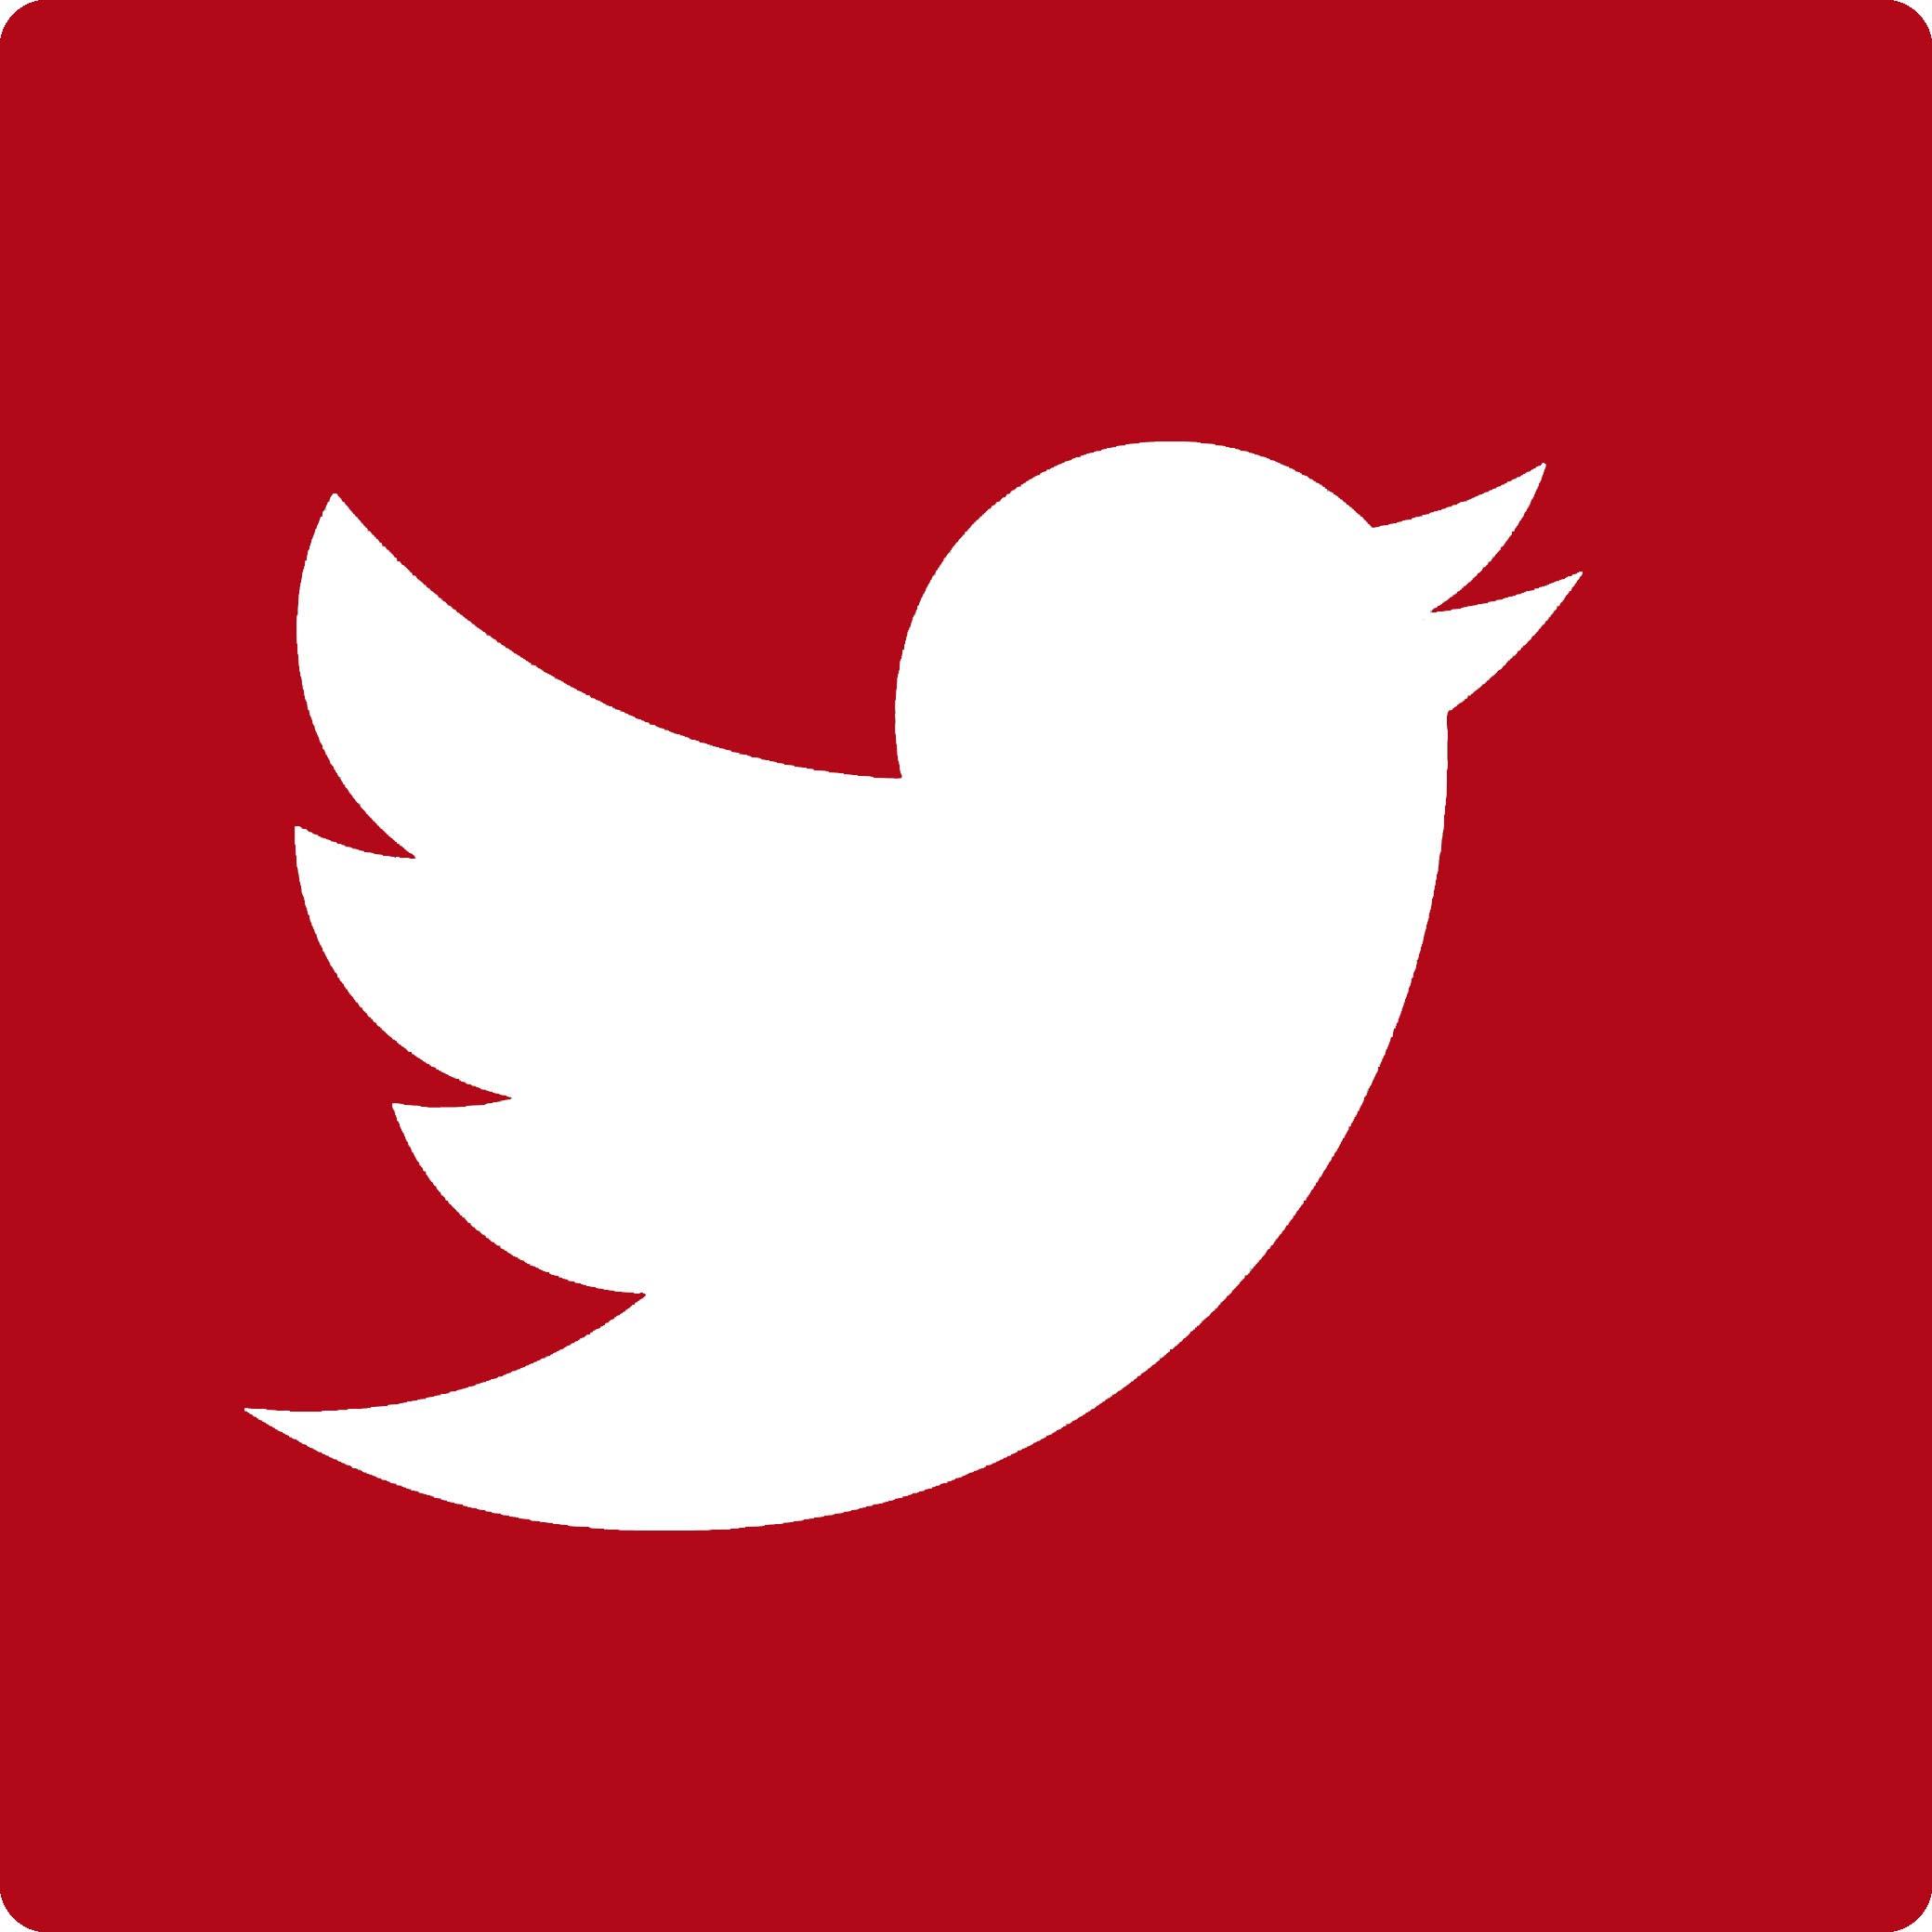 Tweet_Icon2.jpg